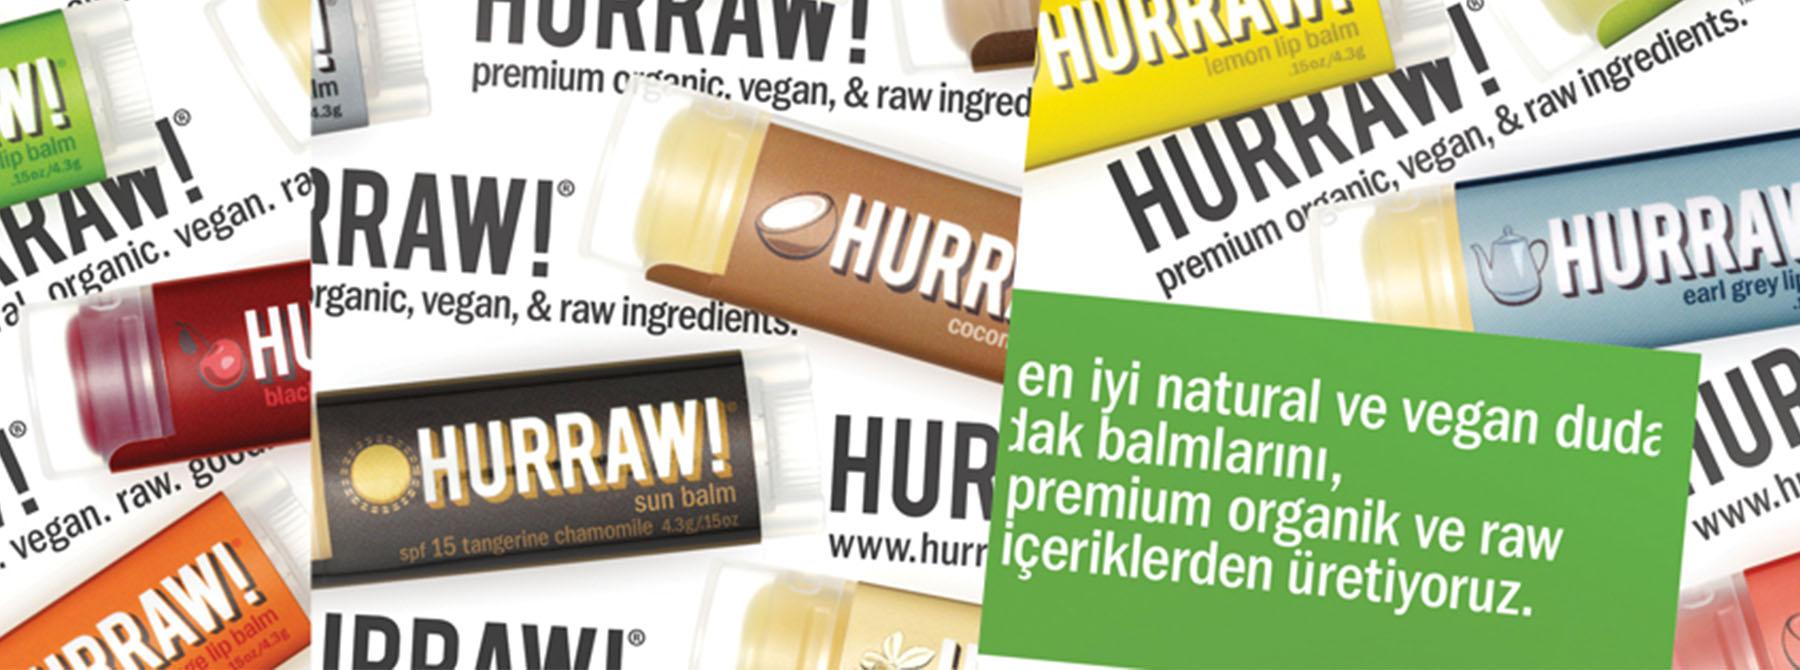 hurraw_banner_3